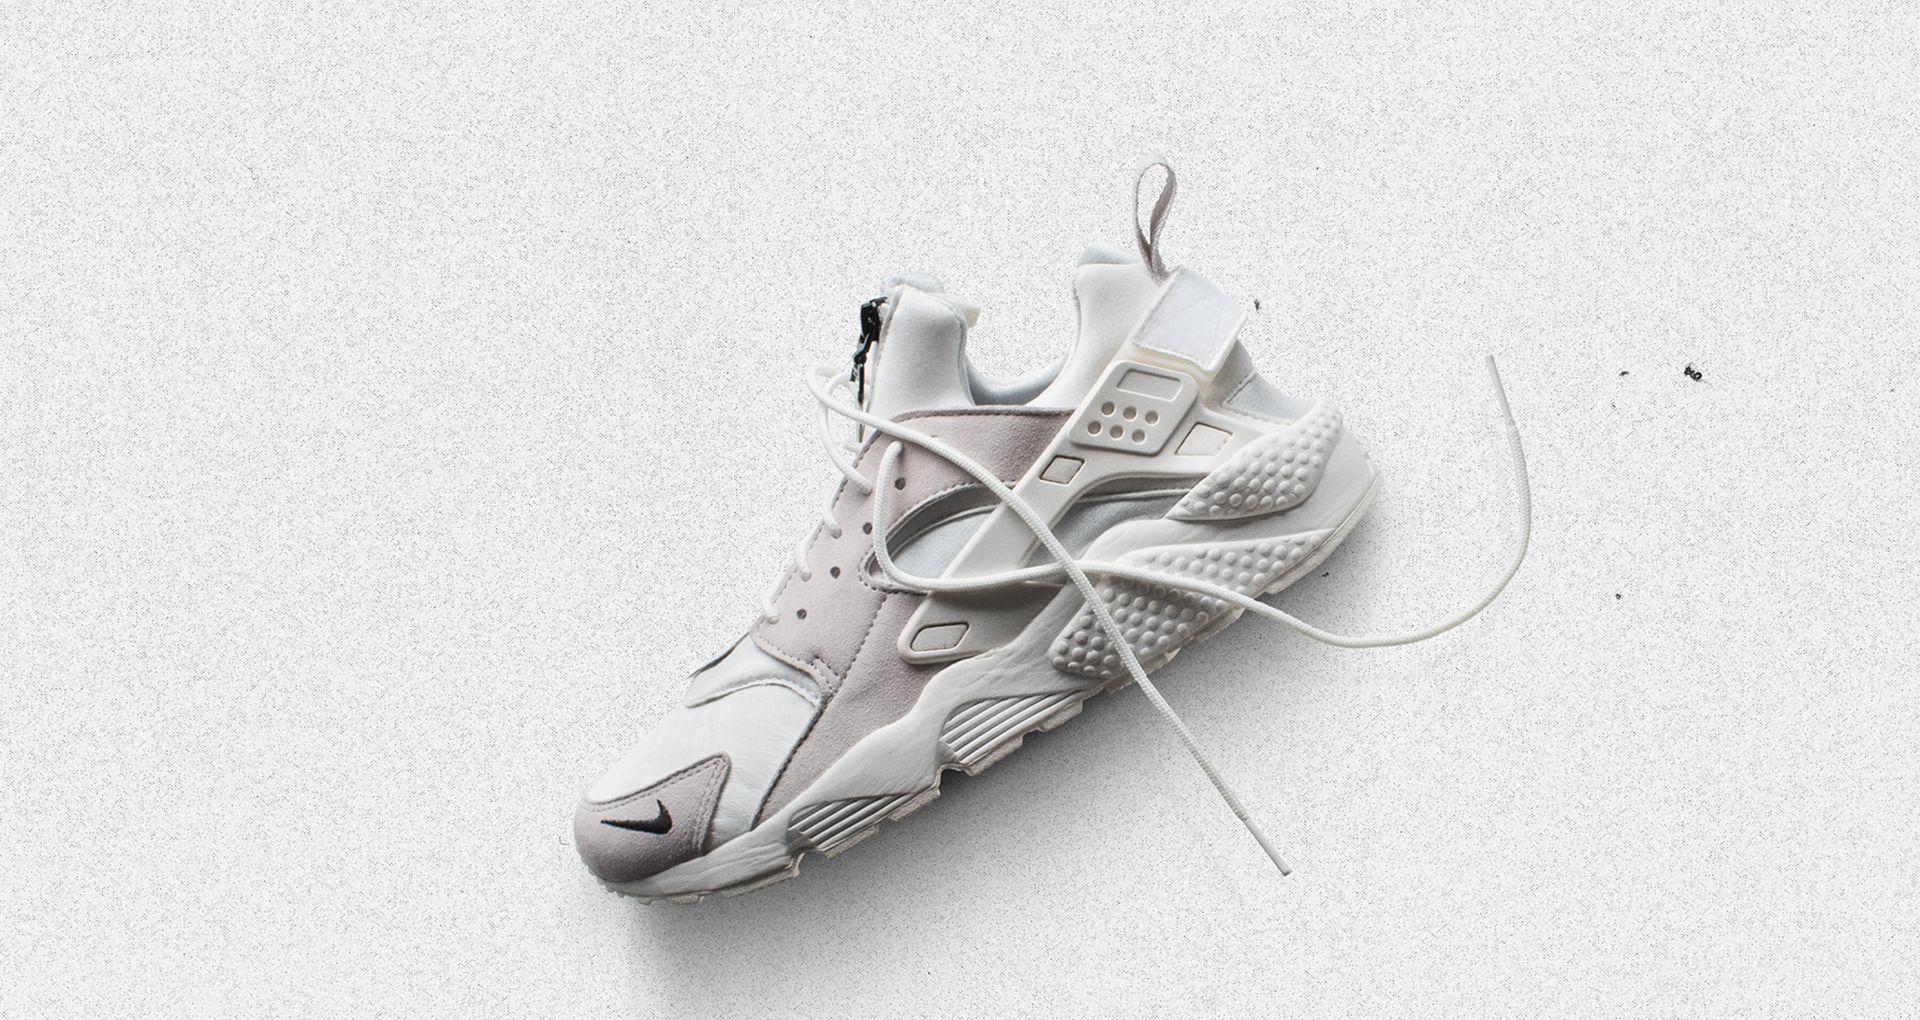 newest e4728 6adf0 Nike Air Huarache All Star 2018 'Vast Grey & White' Release ...